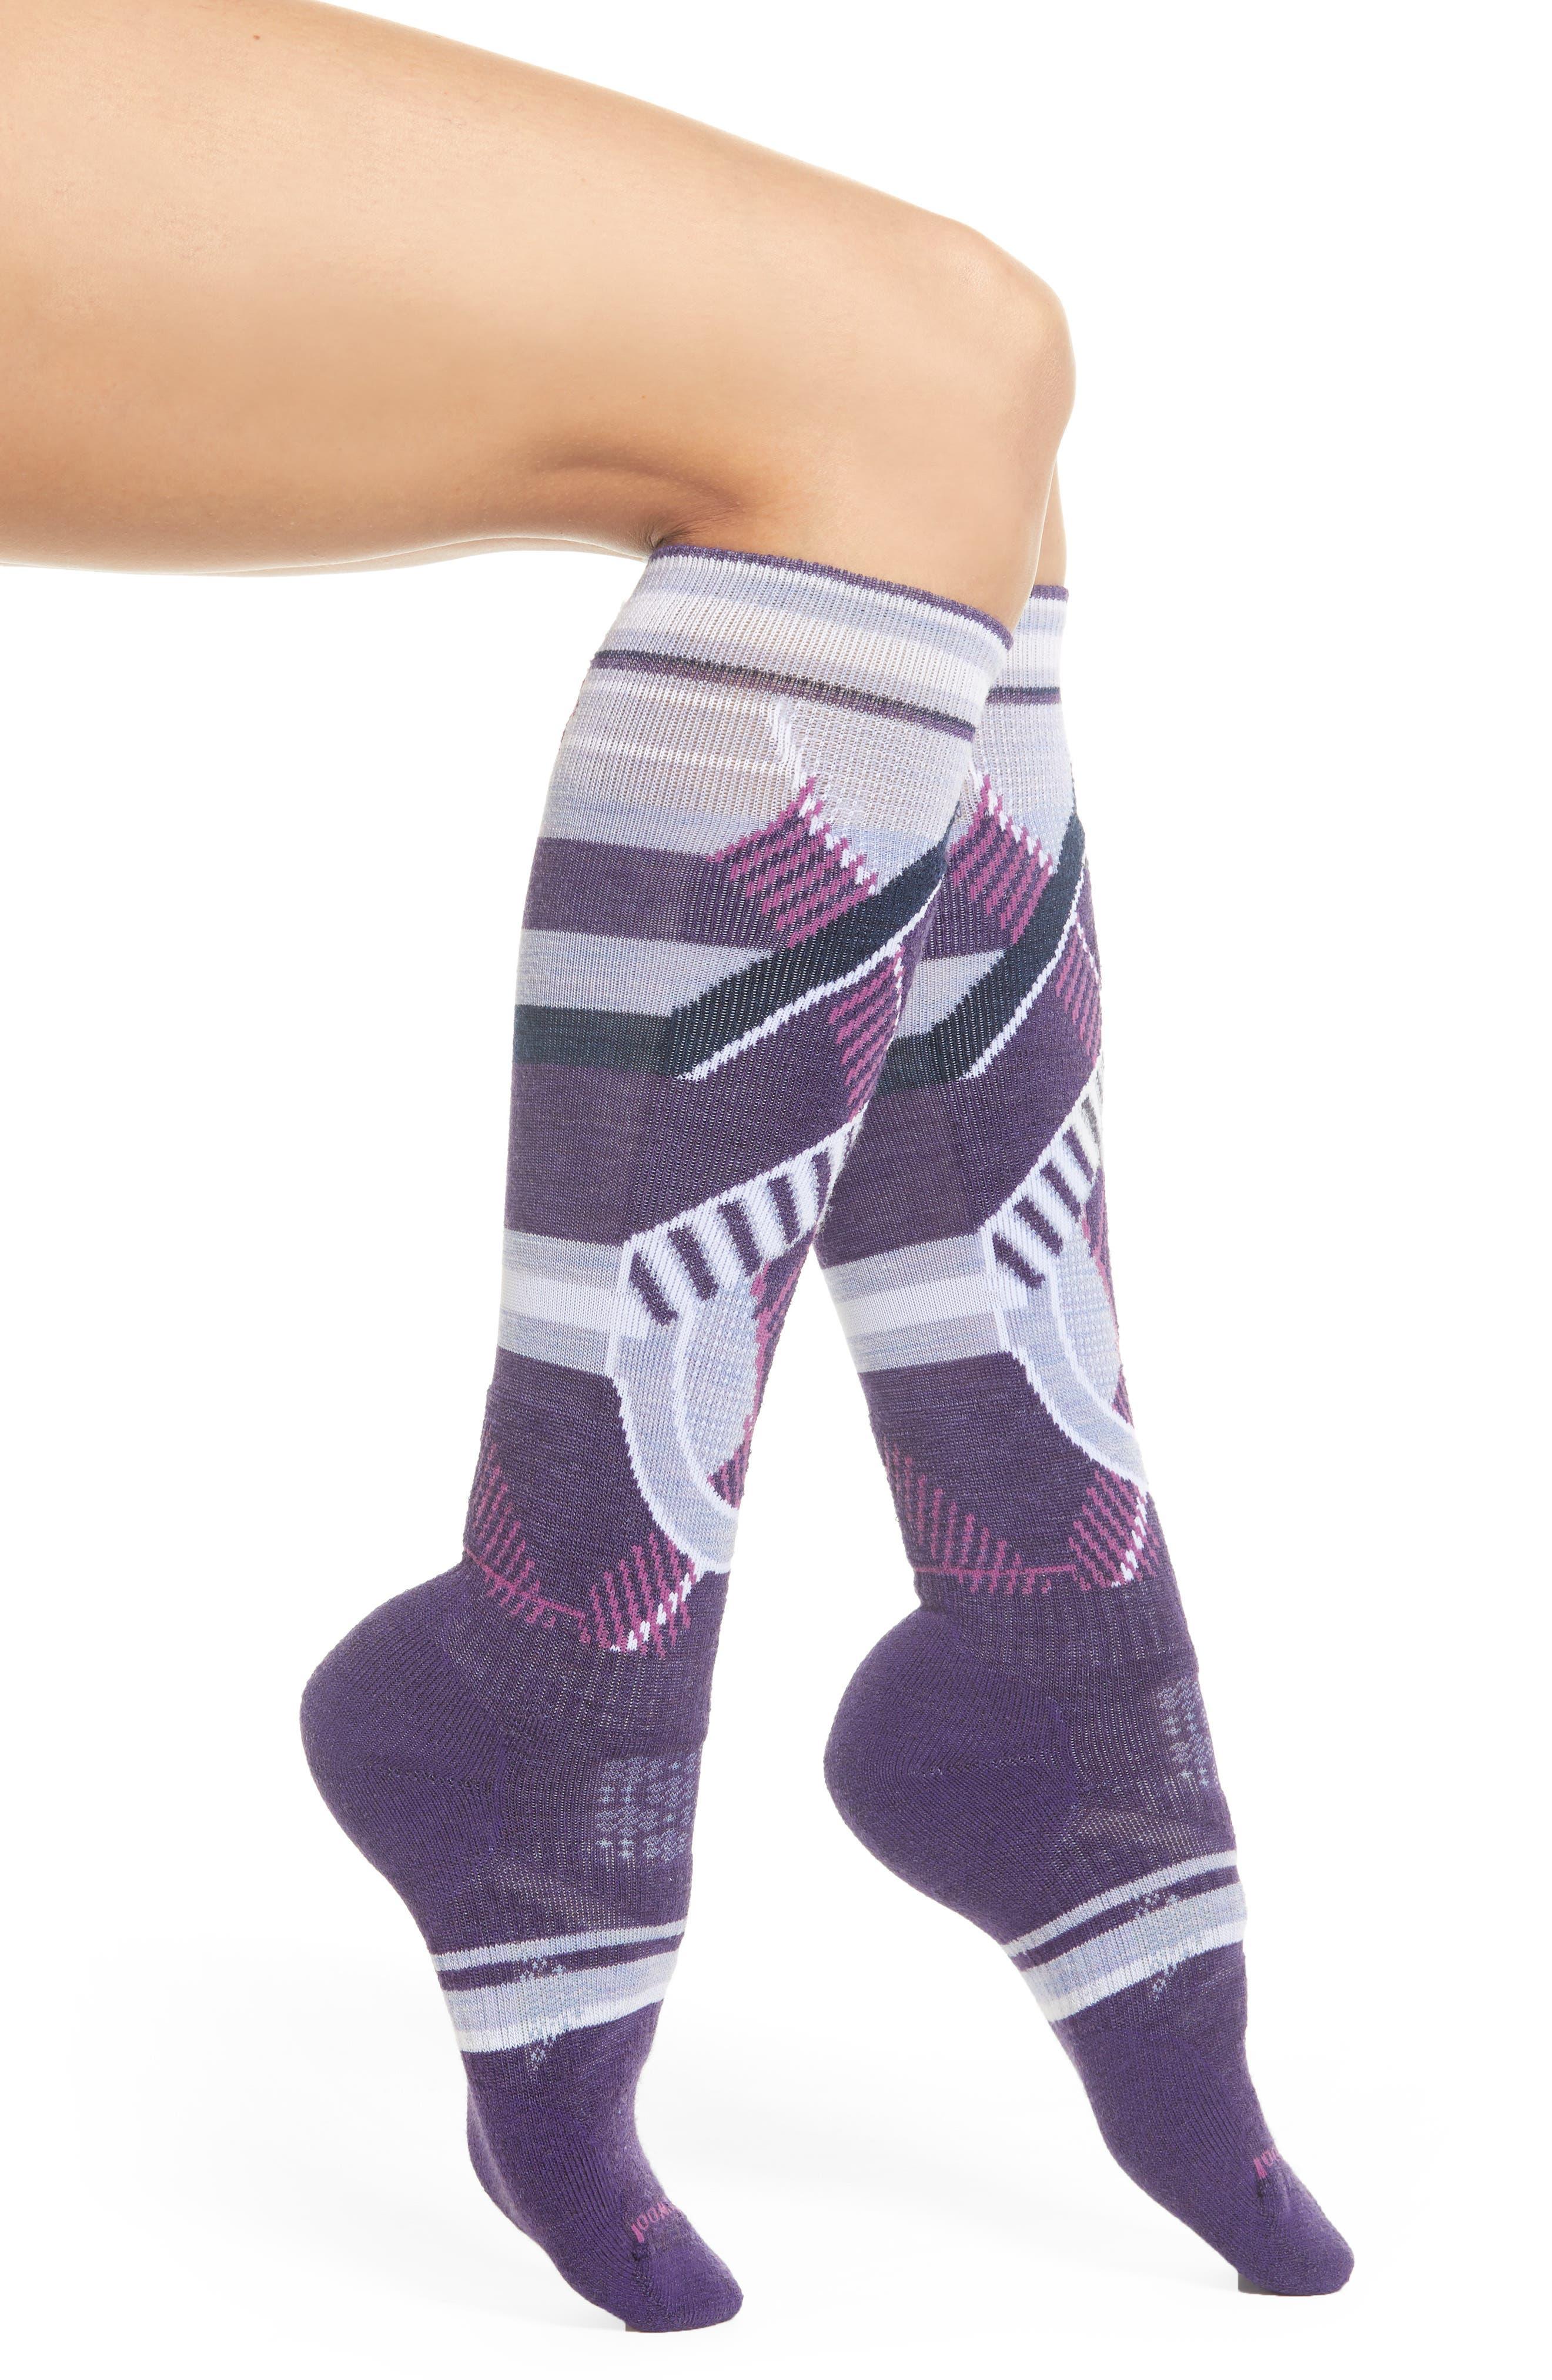 PhD<sup>®</sup> Slopestyle Medium Ski Socks,                             Main thumbnail 1, color,                             MOUNTAIN PURPLE